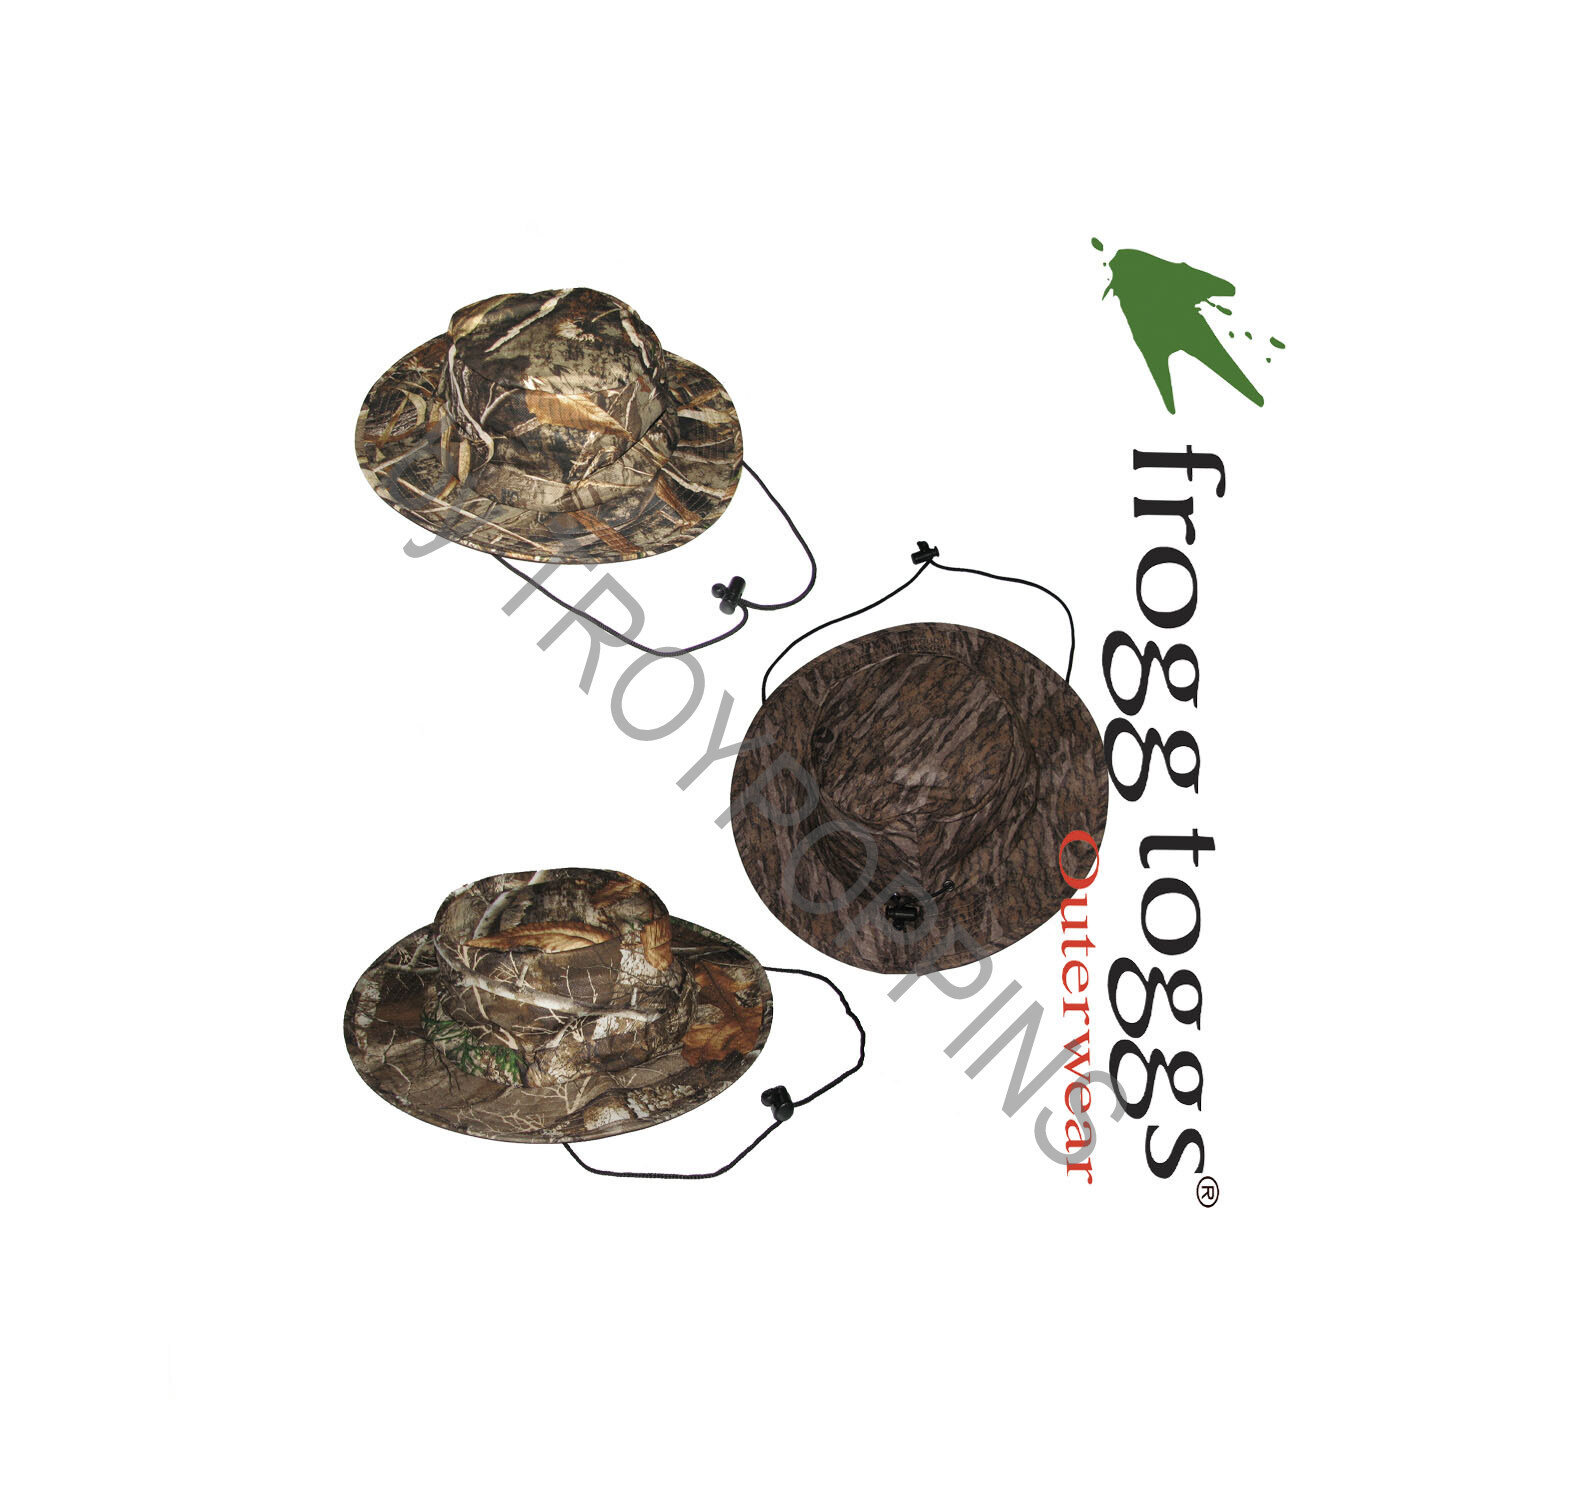 Frogg Toggs Smokin Toad Heat Kit 11201 2-Pack